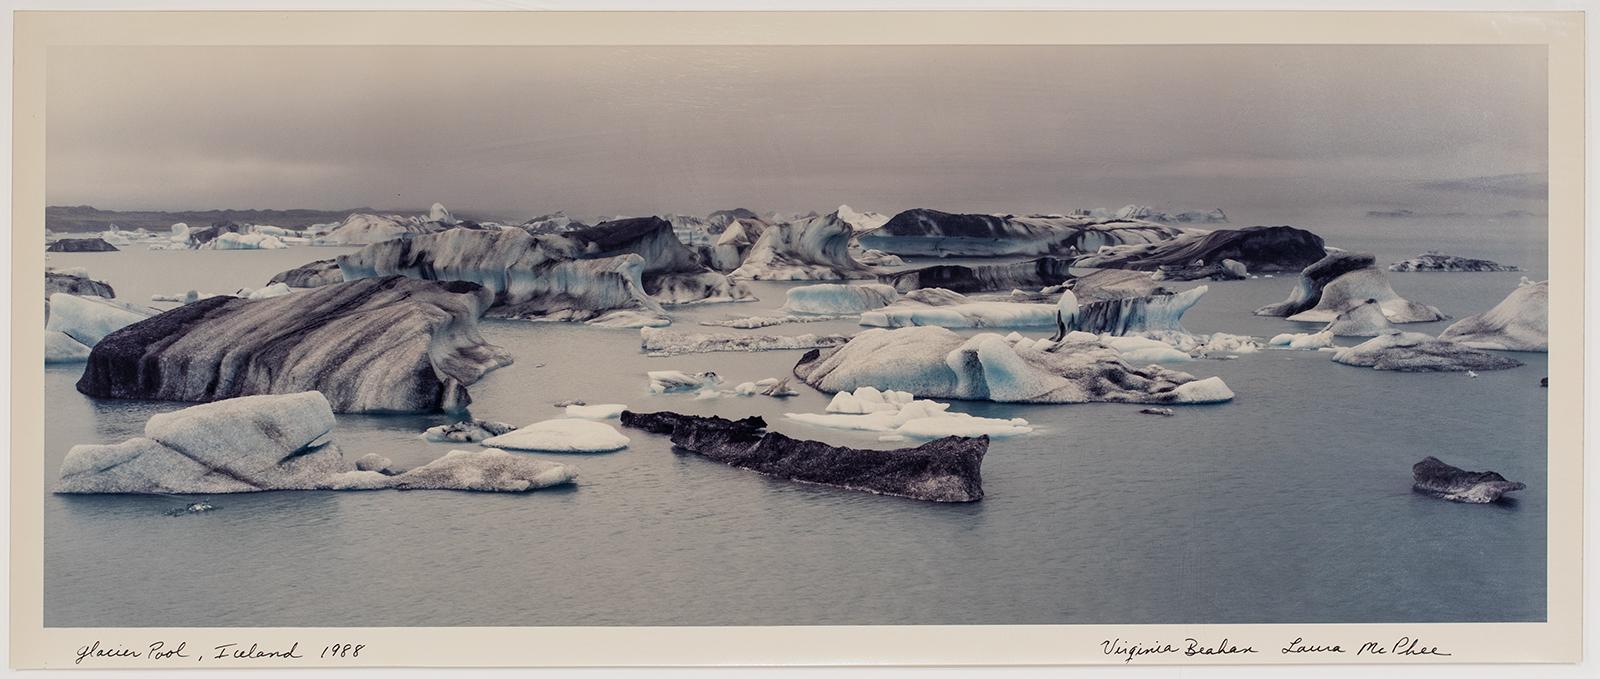 Laura and Beahan, Virginia McPhee, Glacier Pool, Iceland, 1988